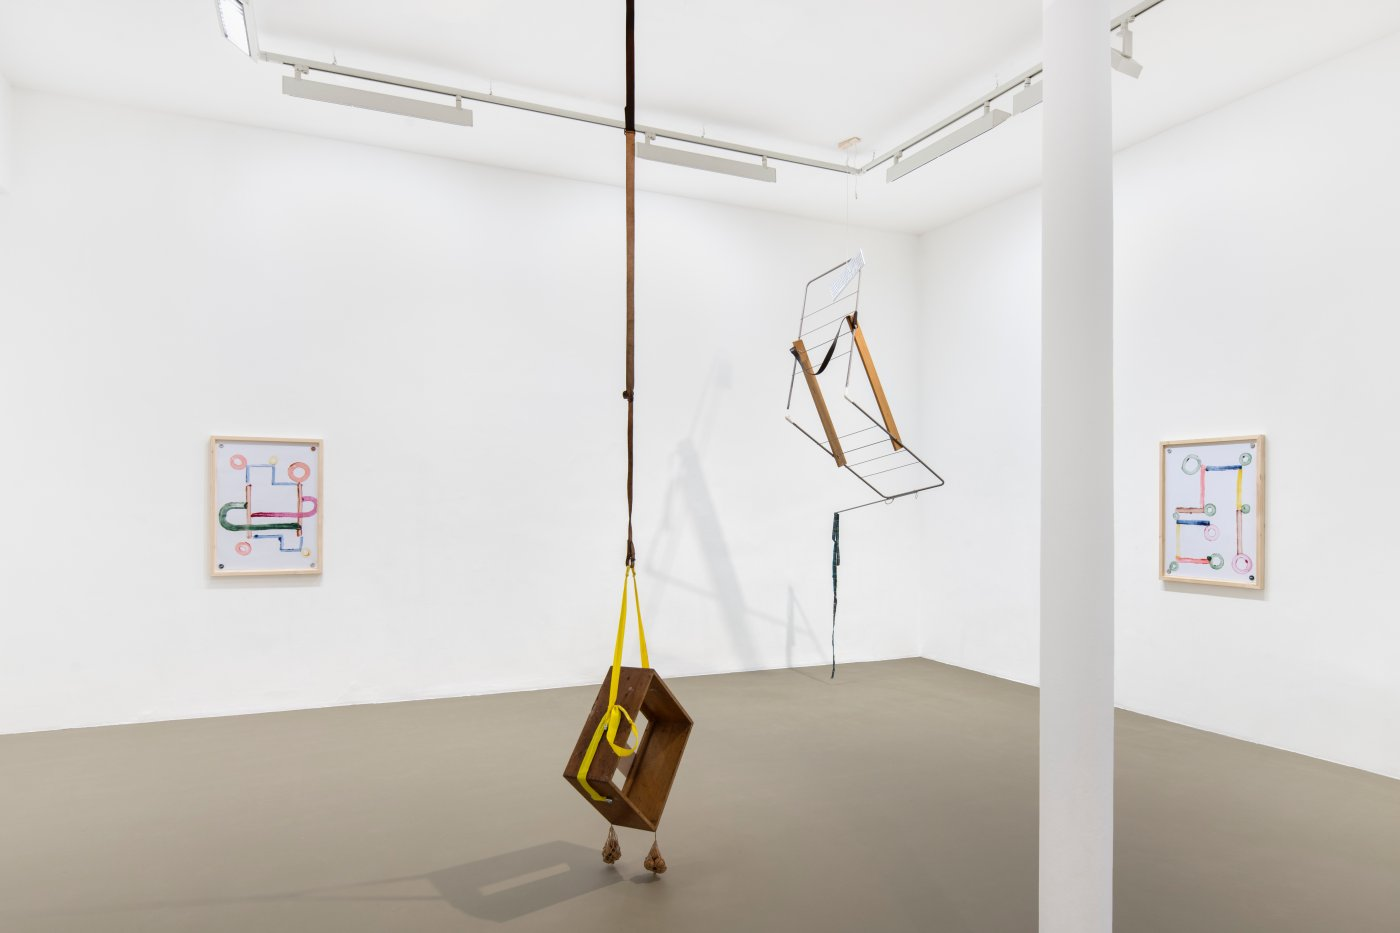 Galerie Chantal Crousel Abraham Cruzvillegas 3